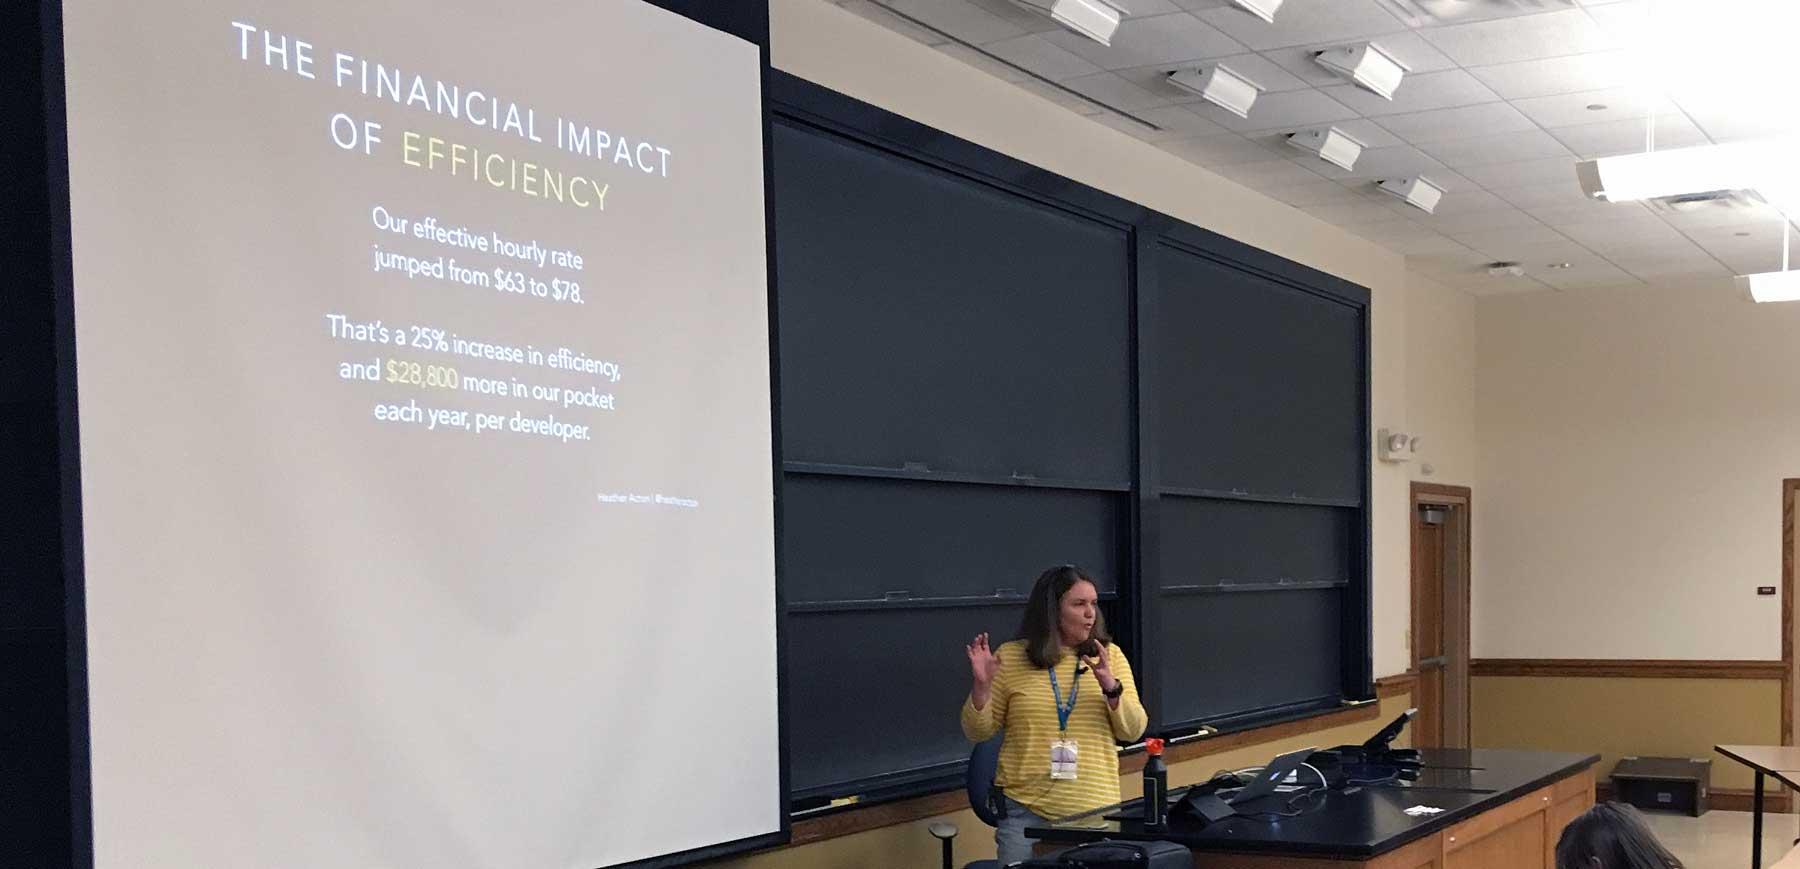 Heather Acton, WordCamp St. Louis 2018